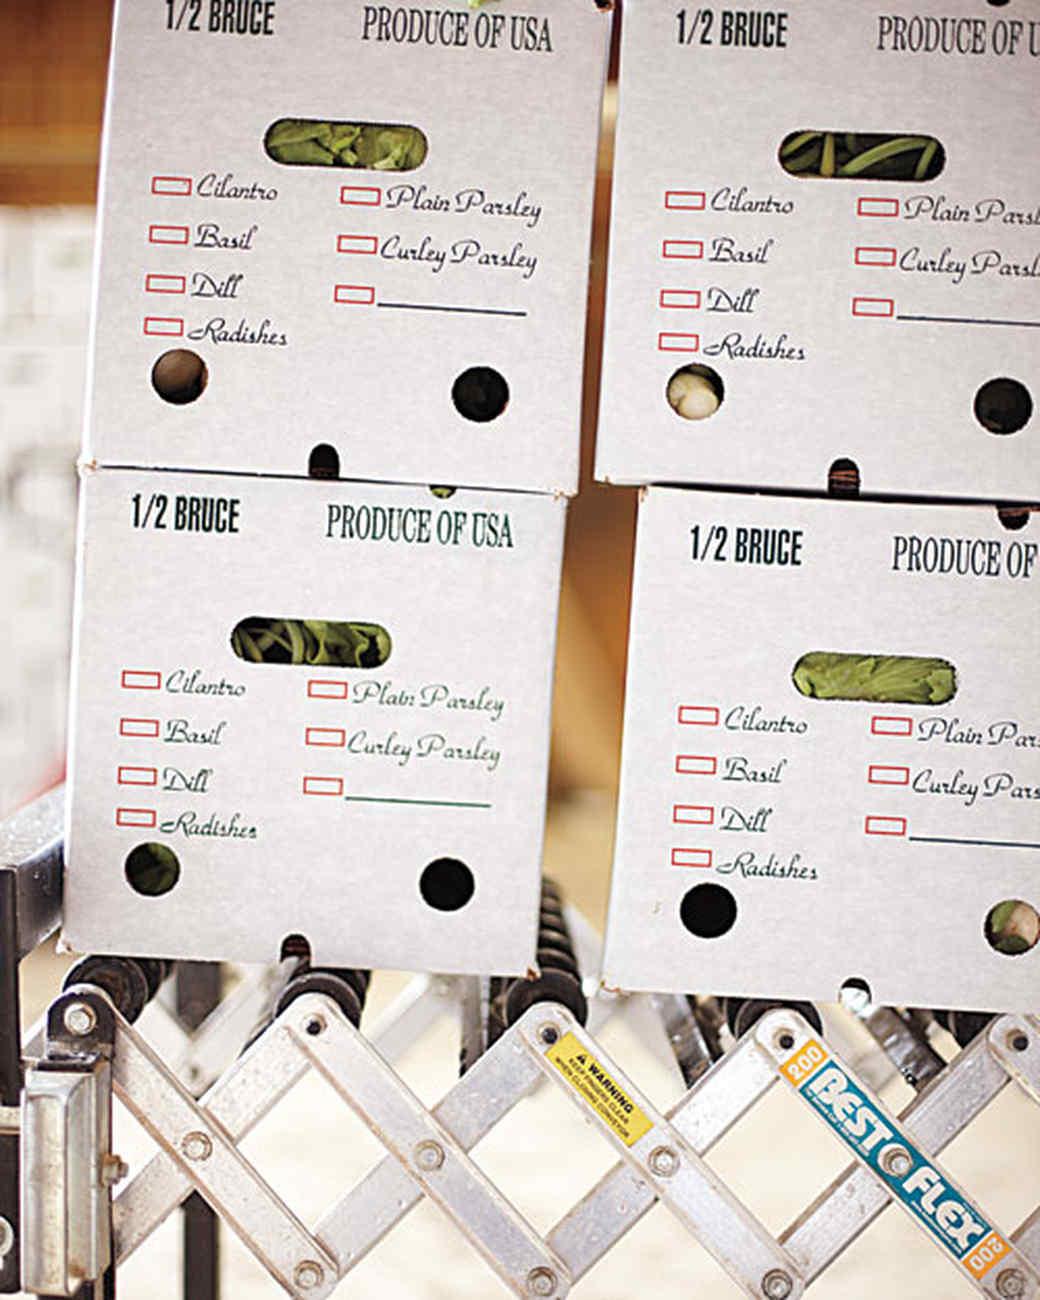 produce-boxes-0611mbd106092-084.jpg